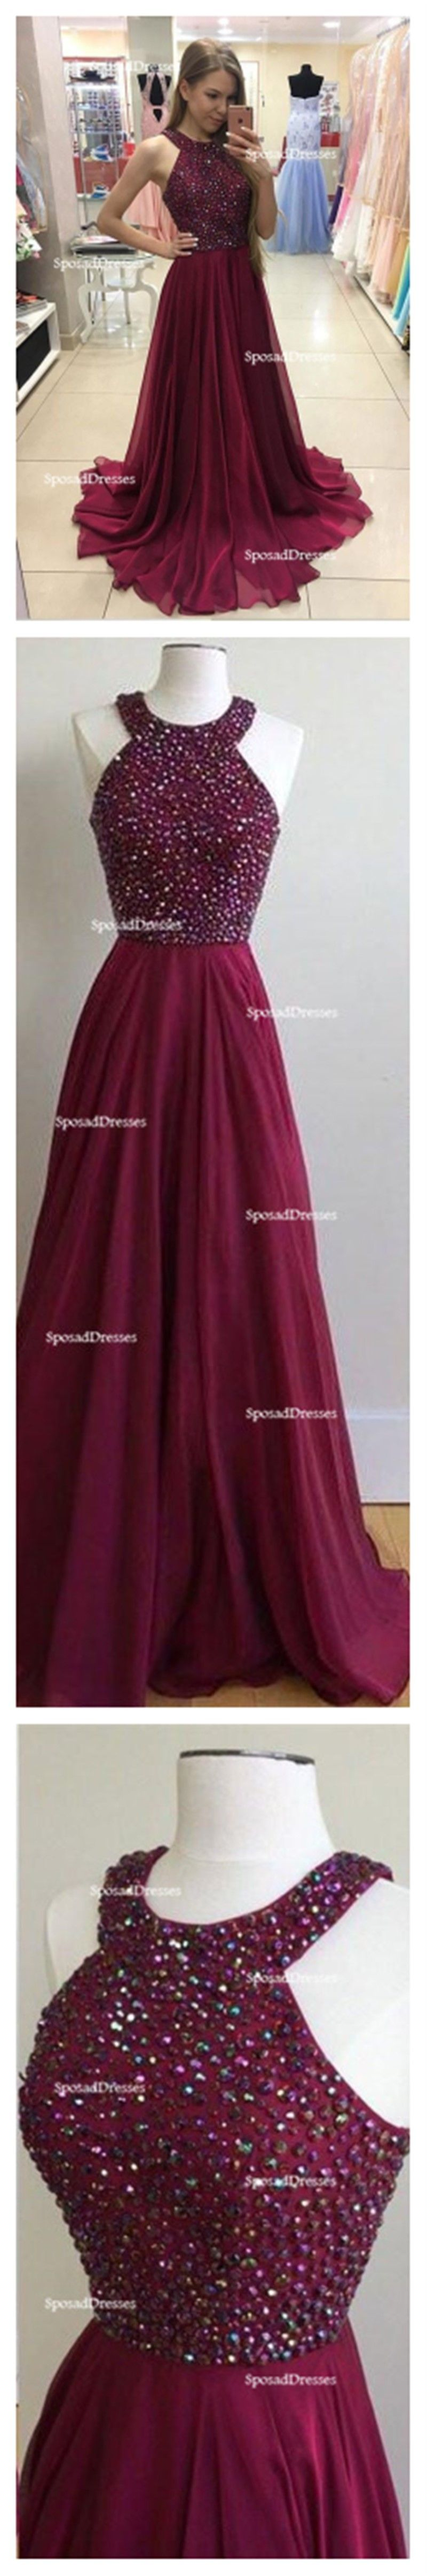 Simple halter burgundy evening prom dresses custom long prom